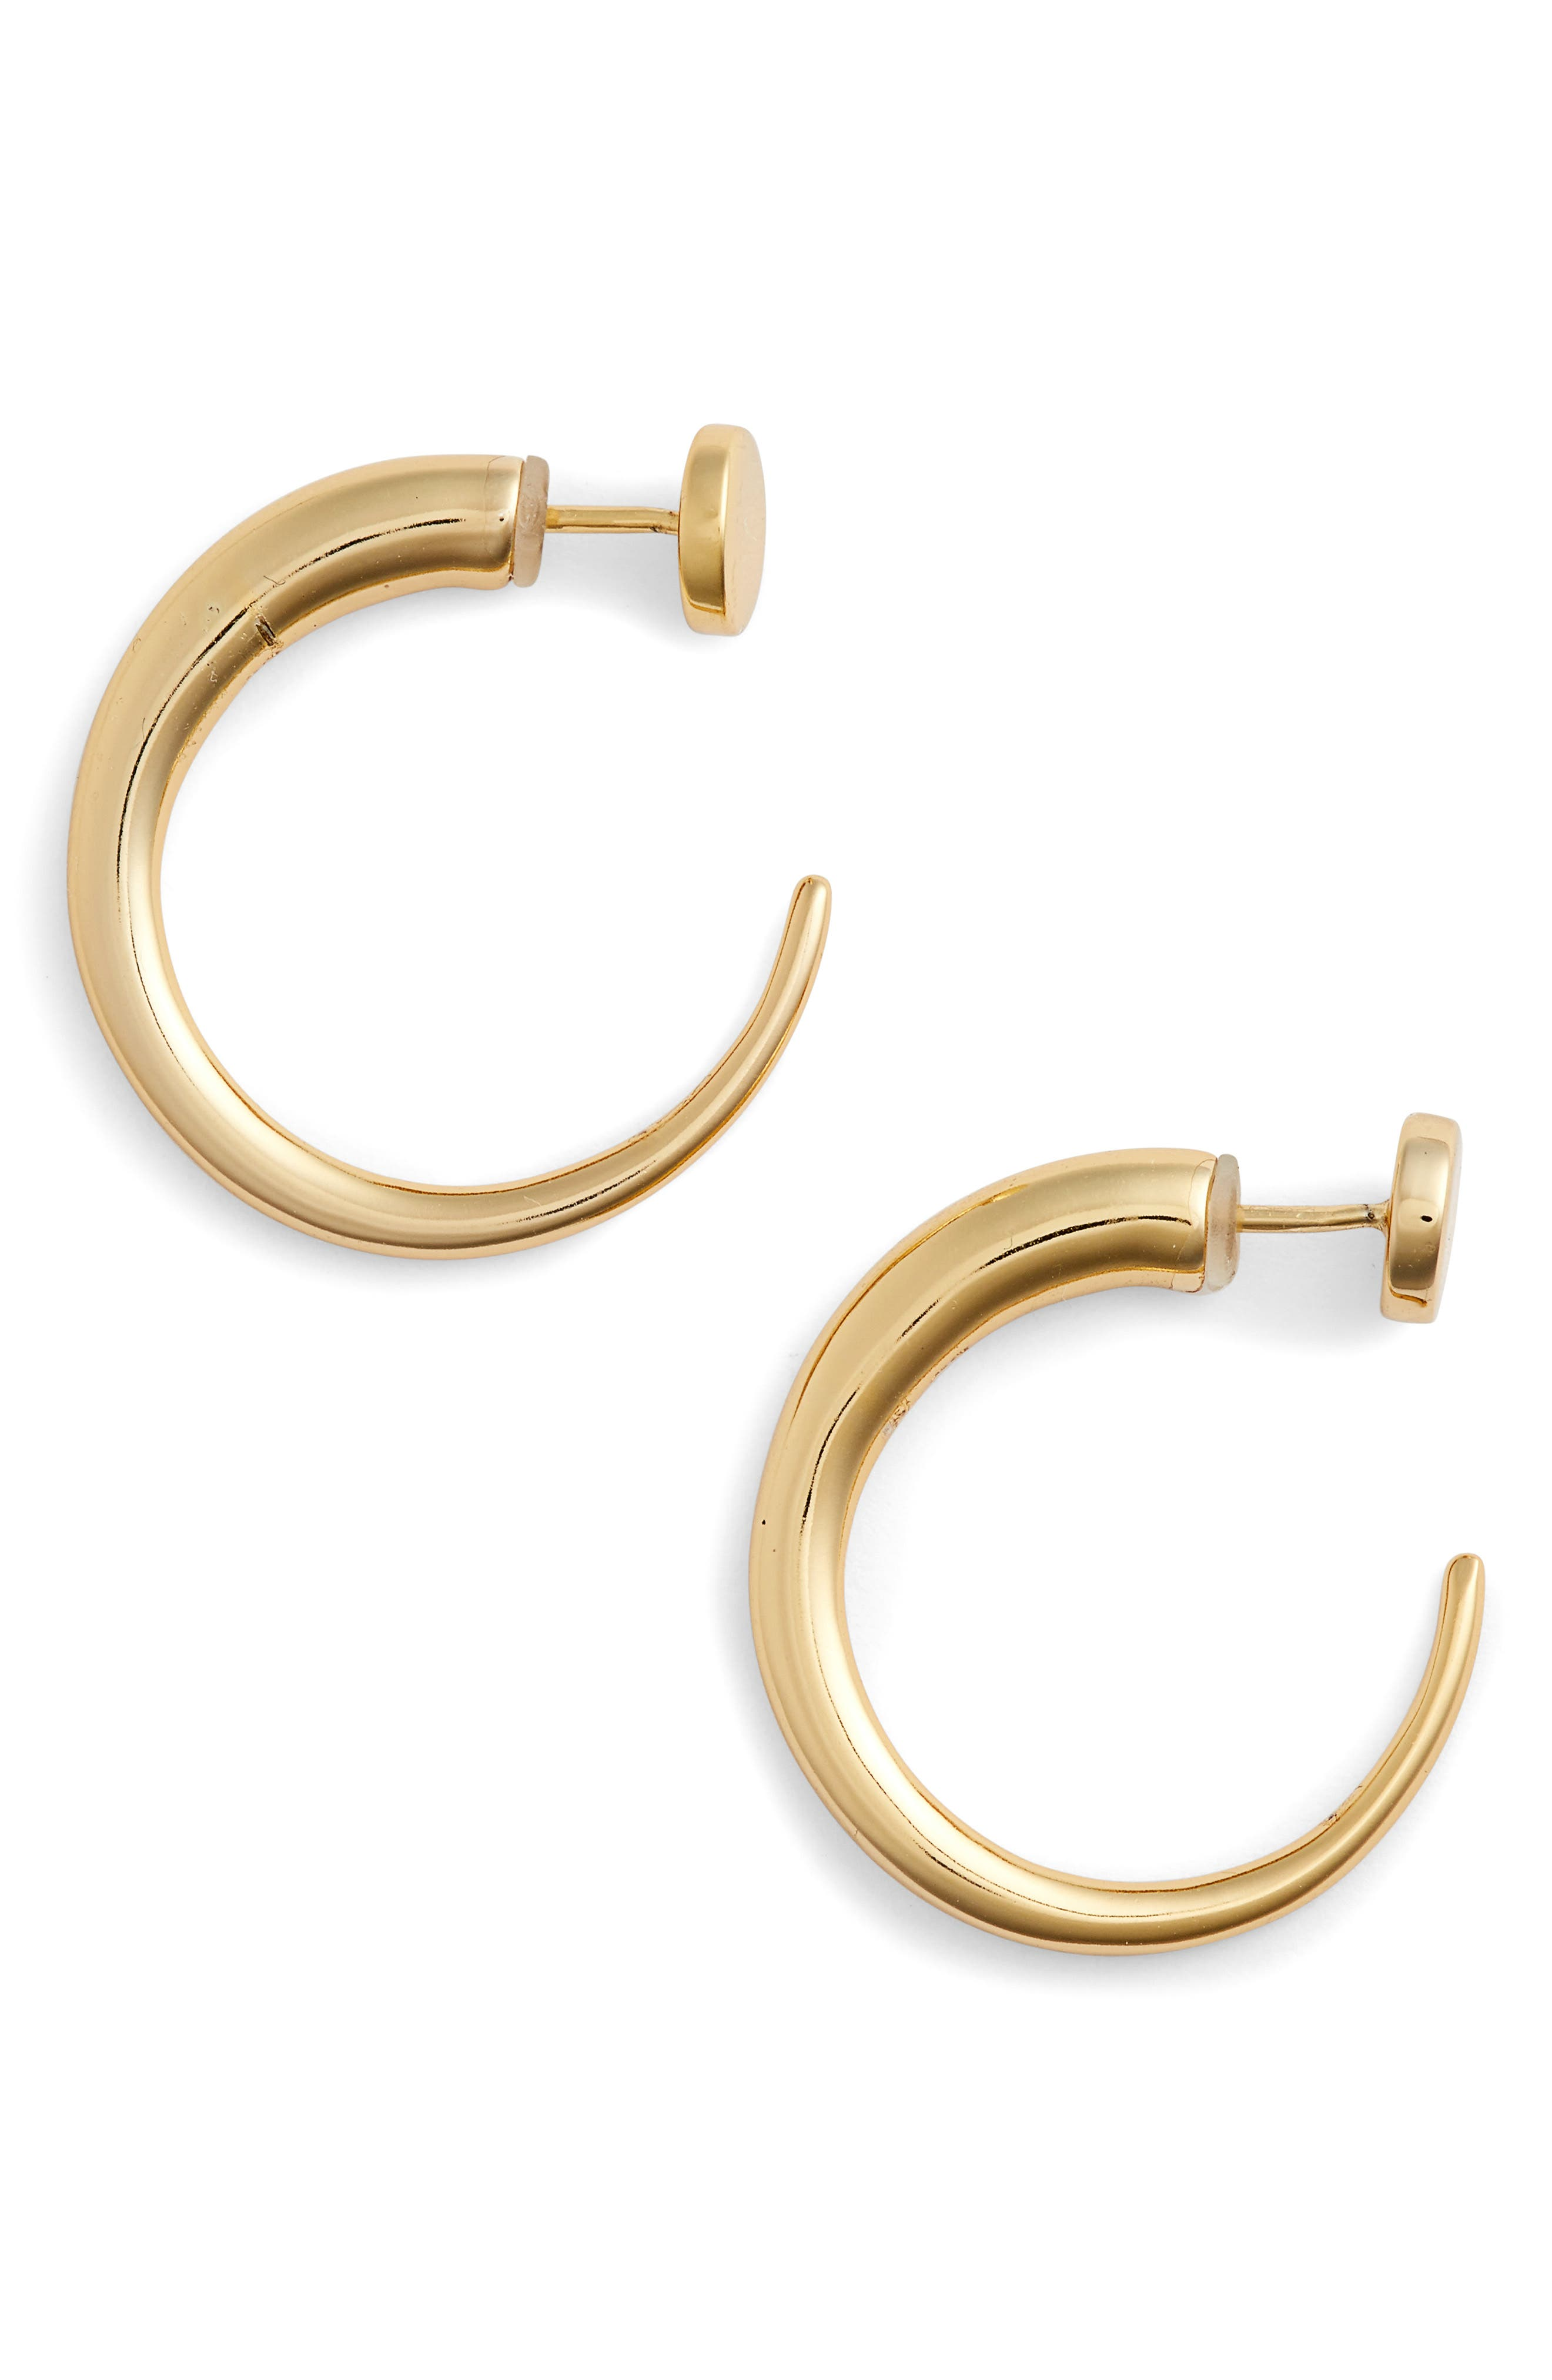 Alternate Image 1 Selected - Jules Smith Yari Hoop Earrings